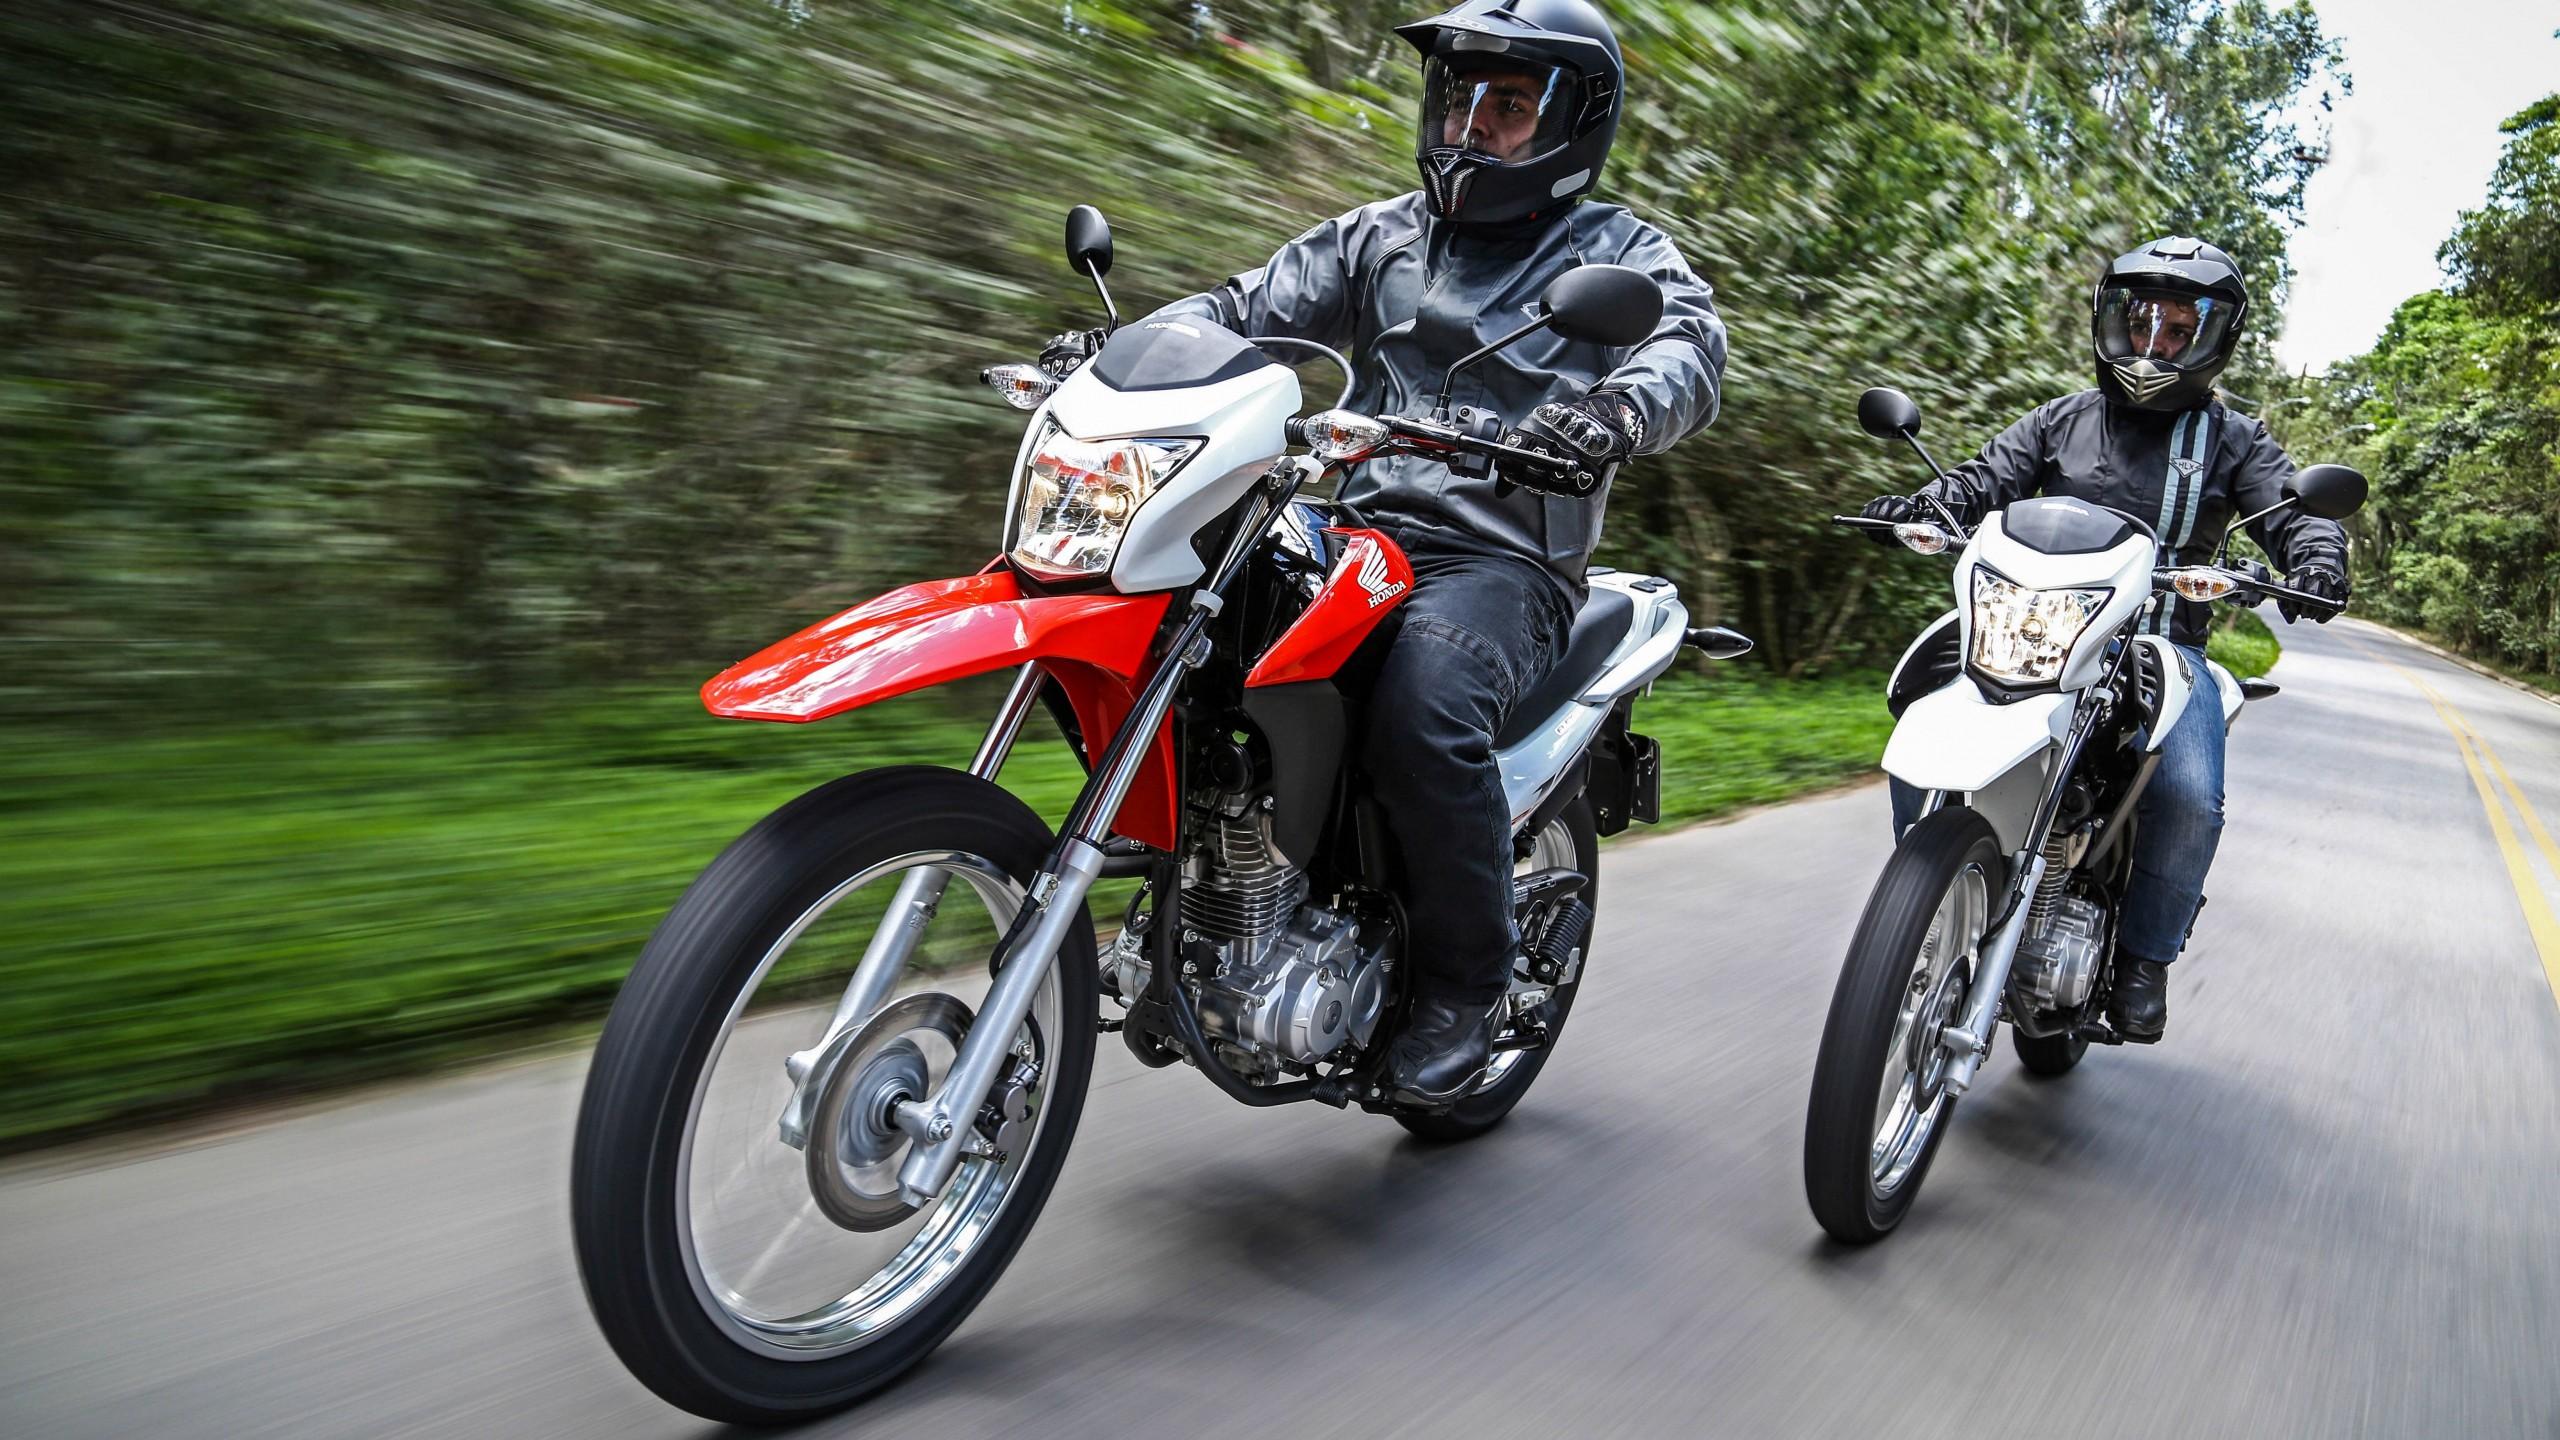 Wallpaper Honda Bros 160 MXR 160 Best Bikes 2015 motorcycle 2560x1440